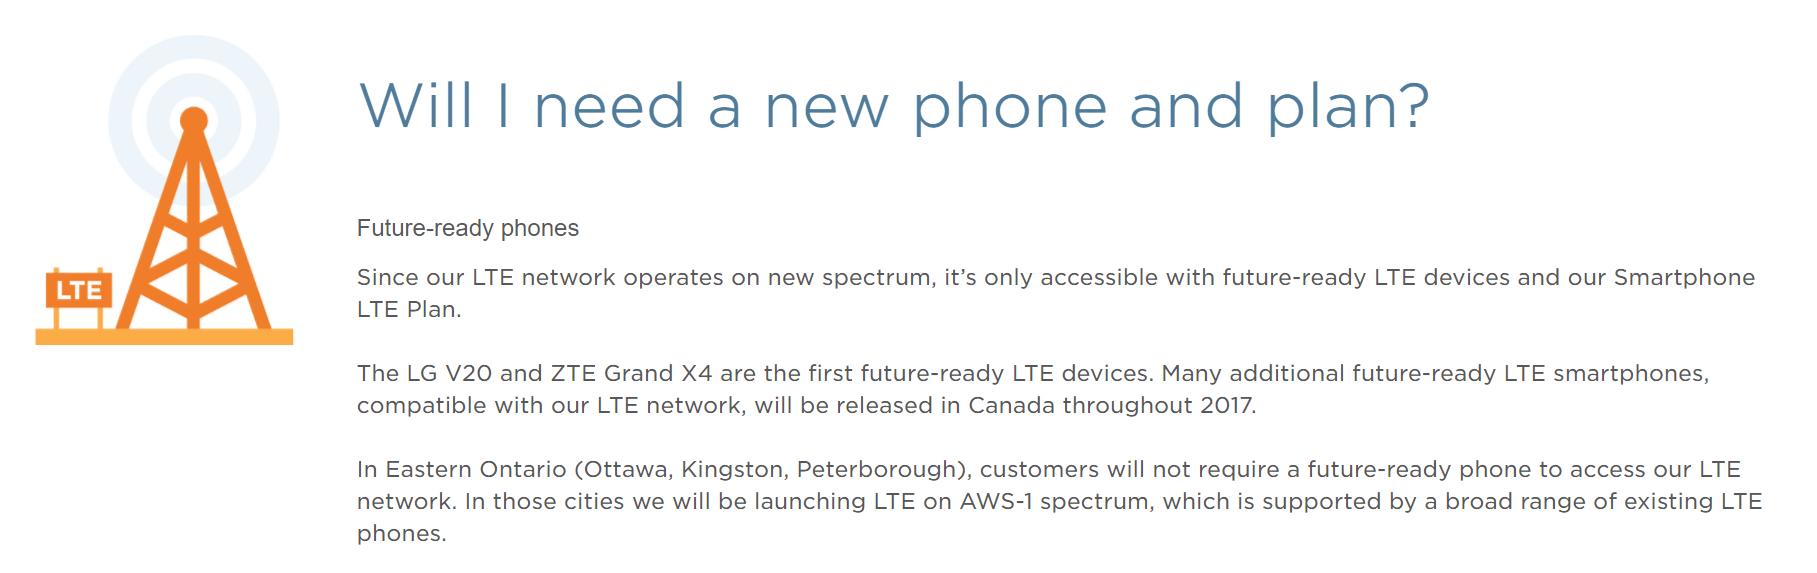 freedom mobile future ready phones